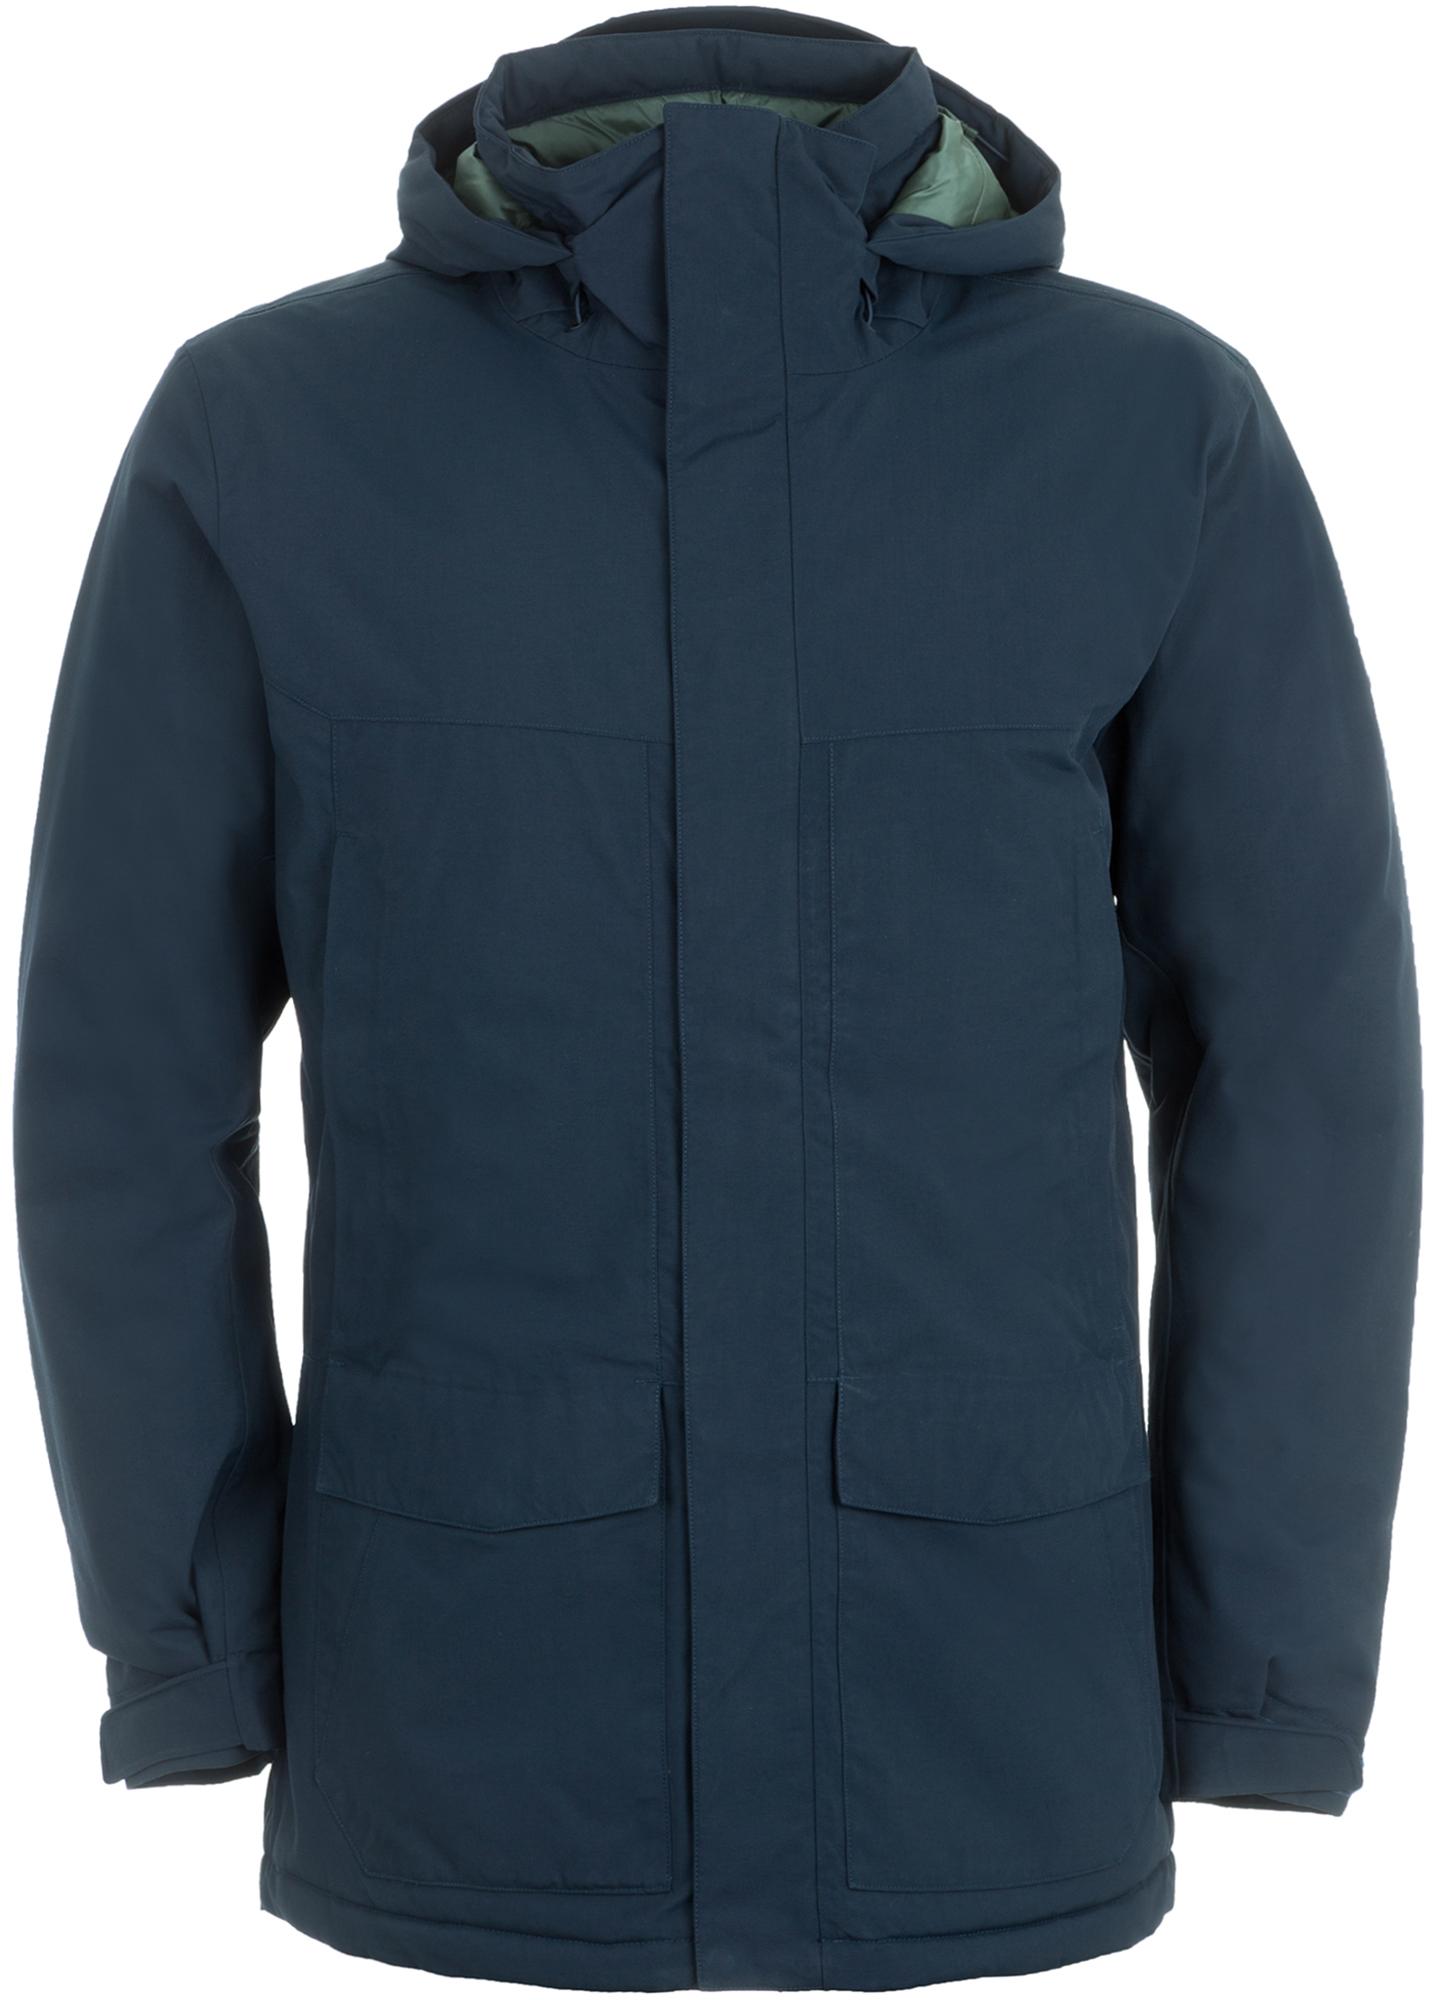 Mountain Hardwear Куртка утепленная мужская Mountain Hardwear Radian, размер 54